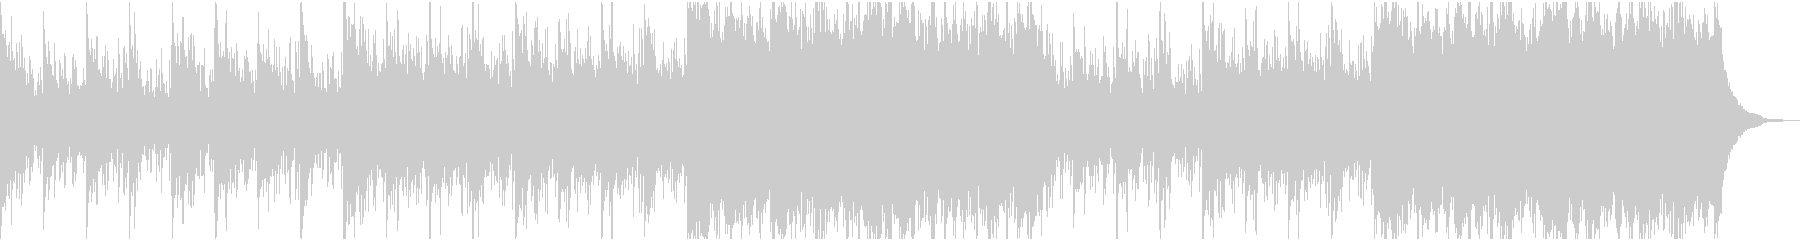 Ambient Pianoの未再生の波形